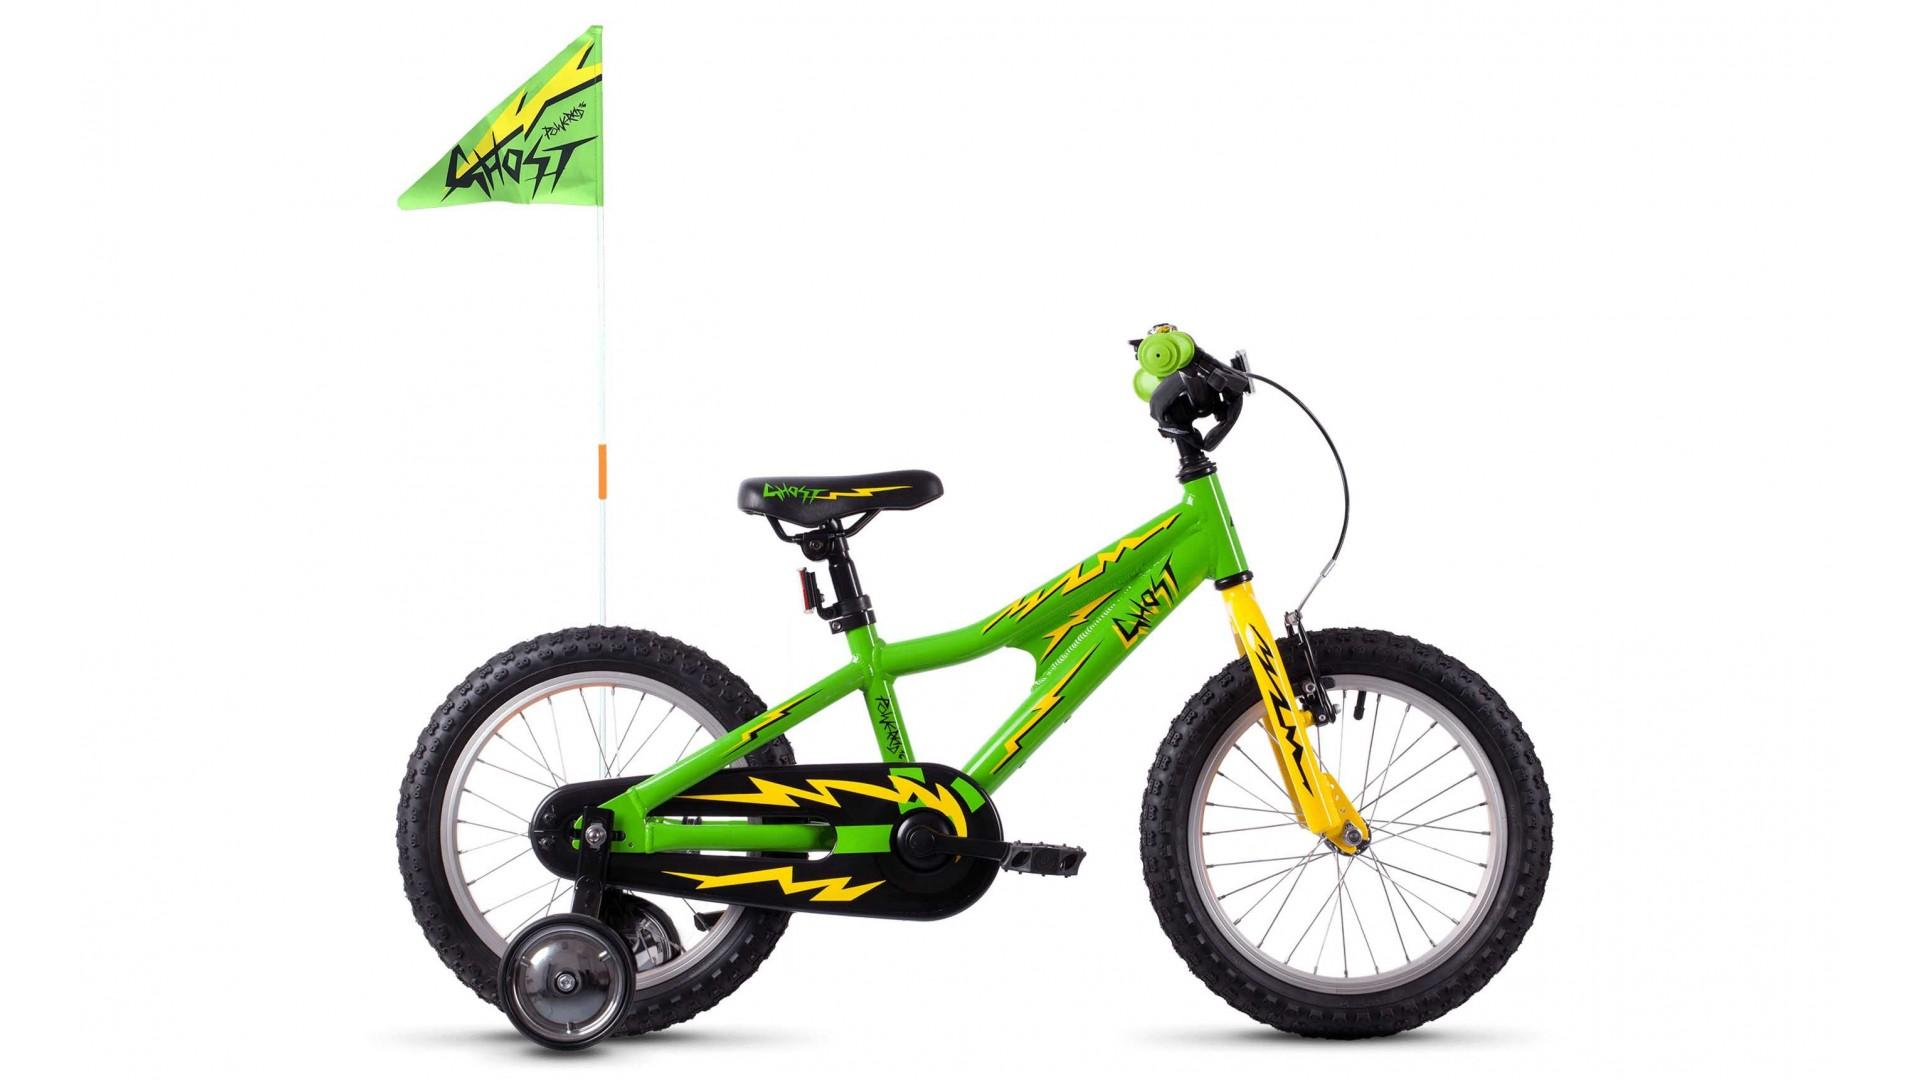 Велосипед GHOST POWERKID AL 16 K right green / cane yellow / night black год 2018